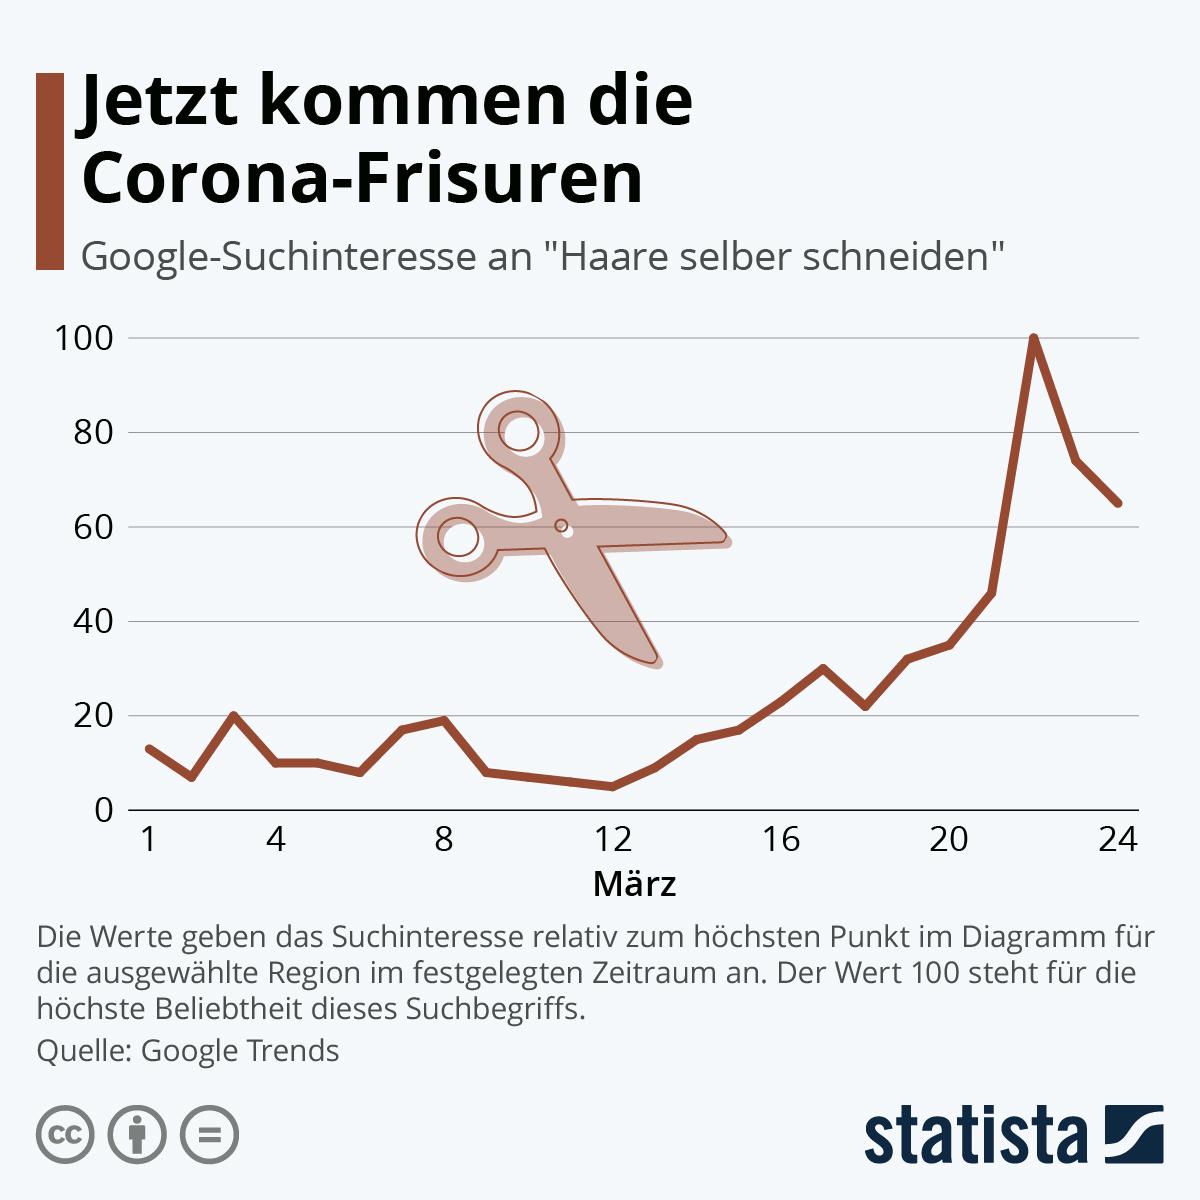 Infografik: Jetzt kommen die Corona-Frisuren | Statista